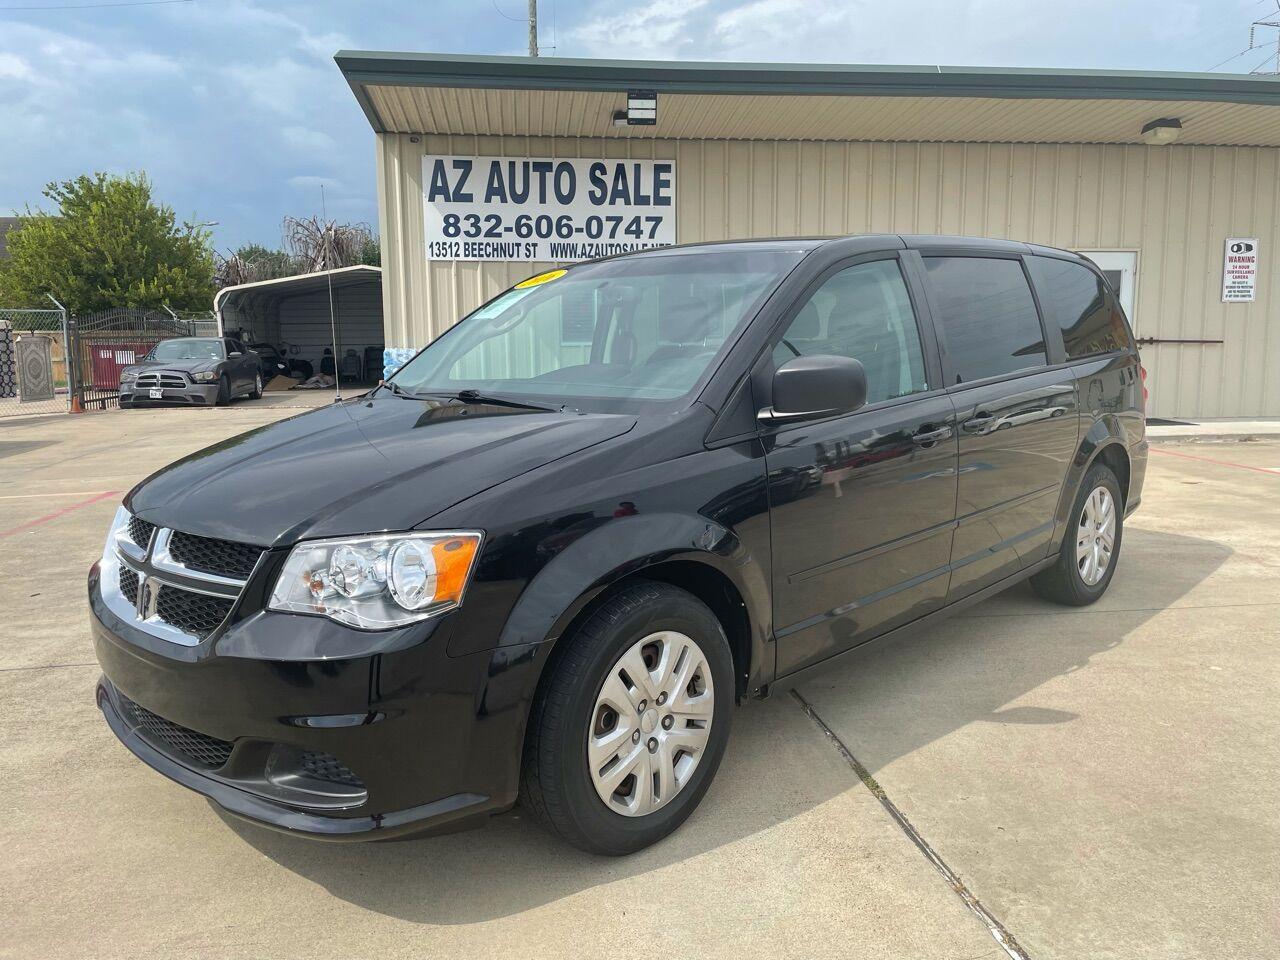 dodge grand caravan for sale texas Dodge Grand Caravan For Sale In Texas - Carsforsale.com®